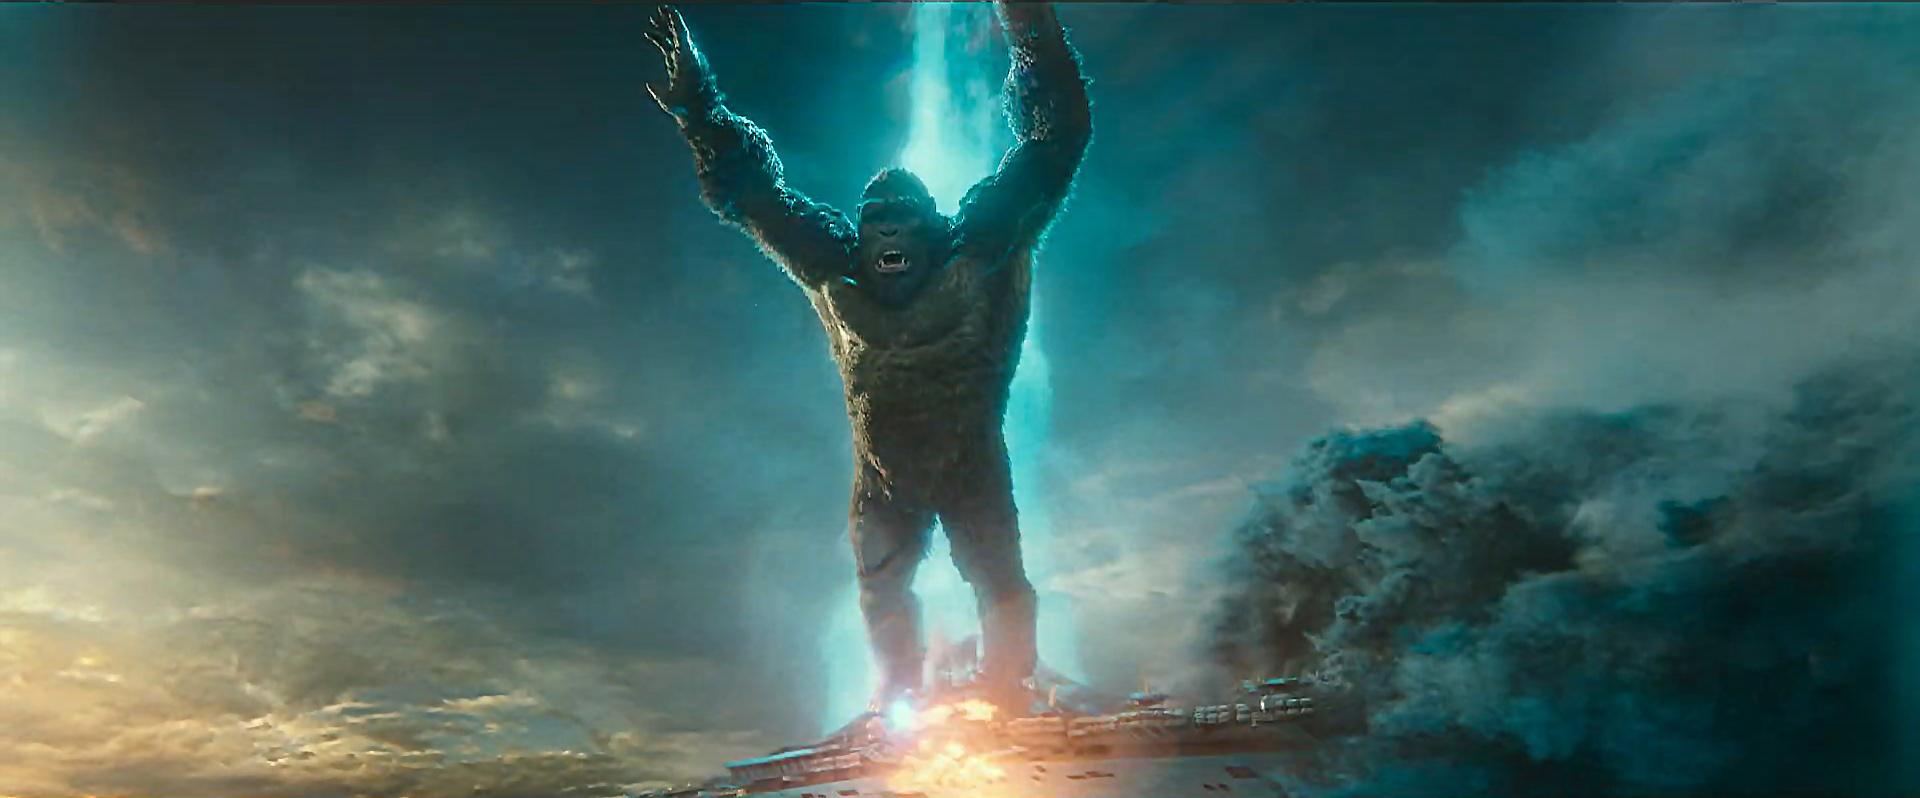 Godzilla vs Kong Trailer Still 47 - Kong escapes